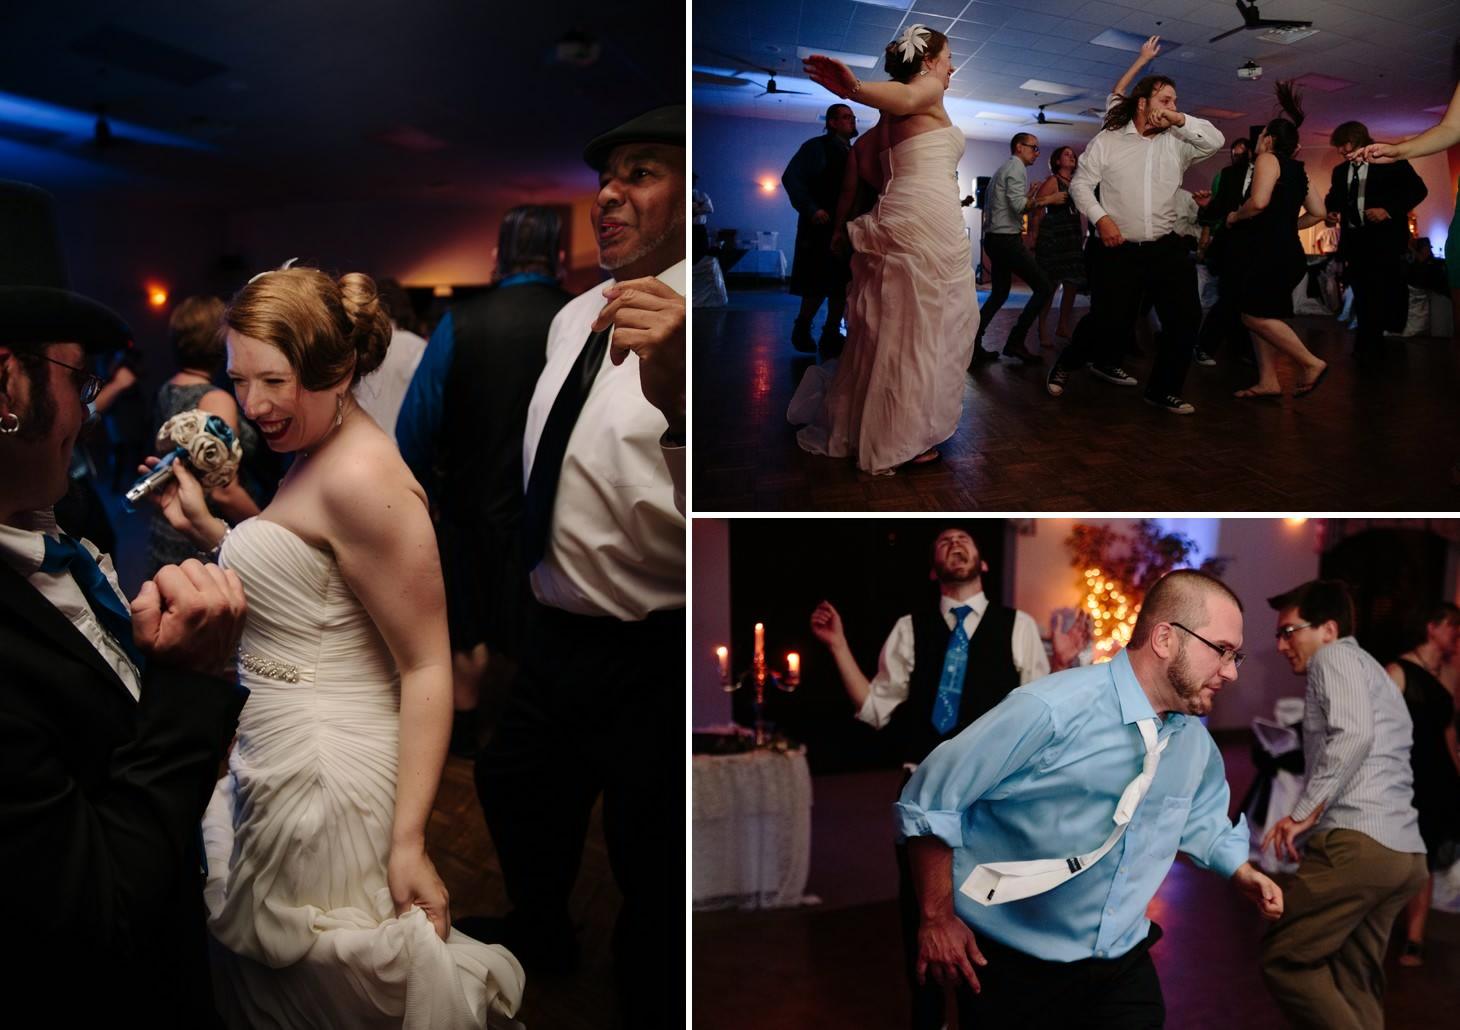 067-nyc-wedding-photographer-nj-nerdy-dr-who-firehouse-wedding-smitten-chickens.jpg